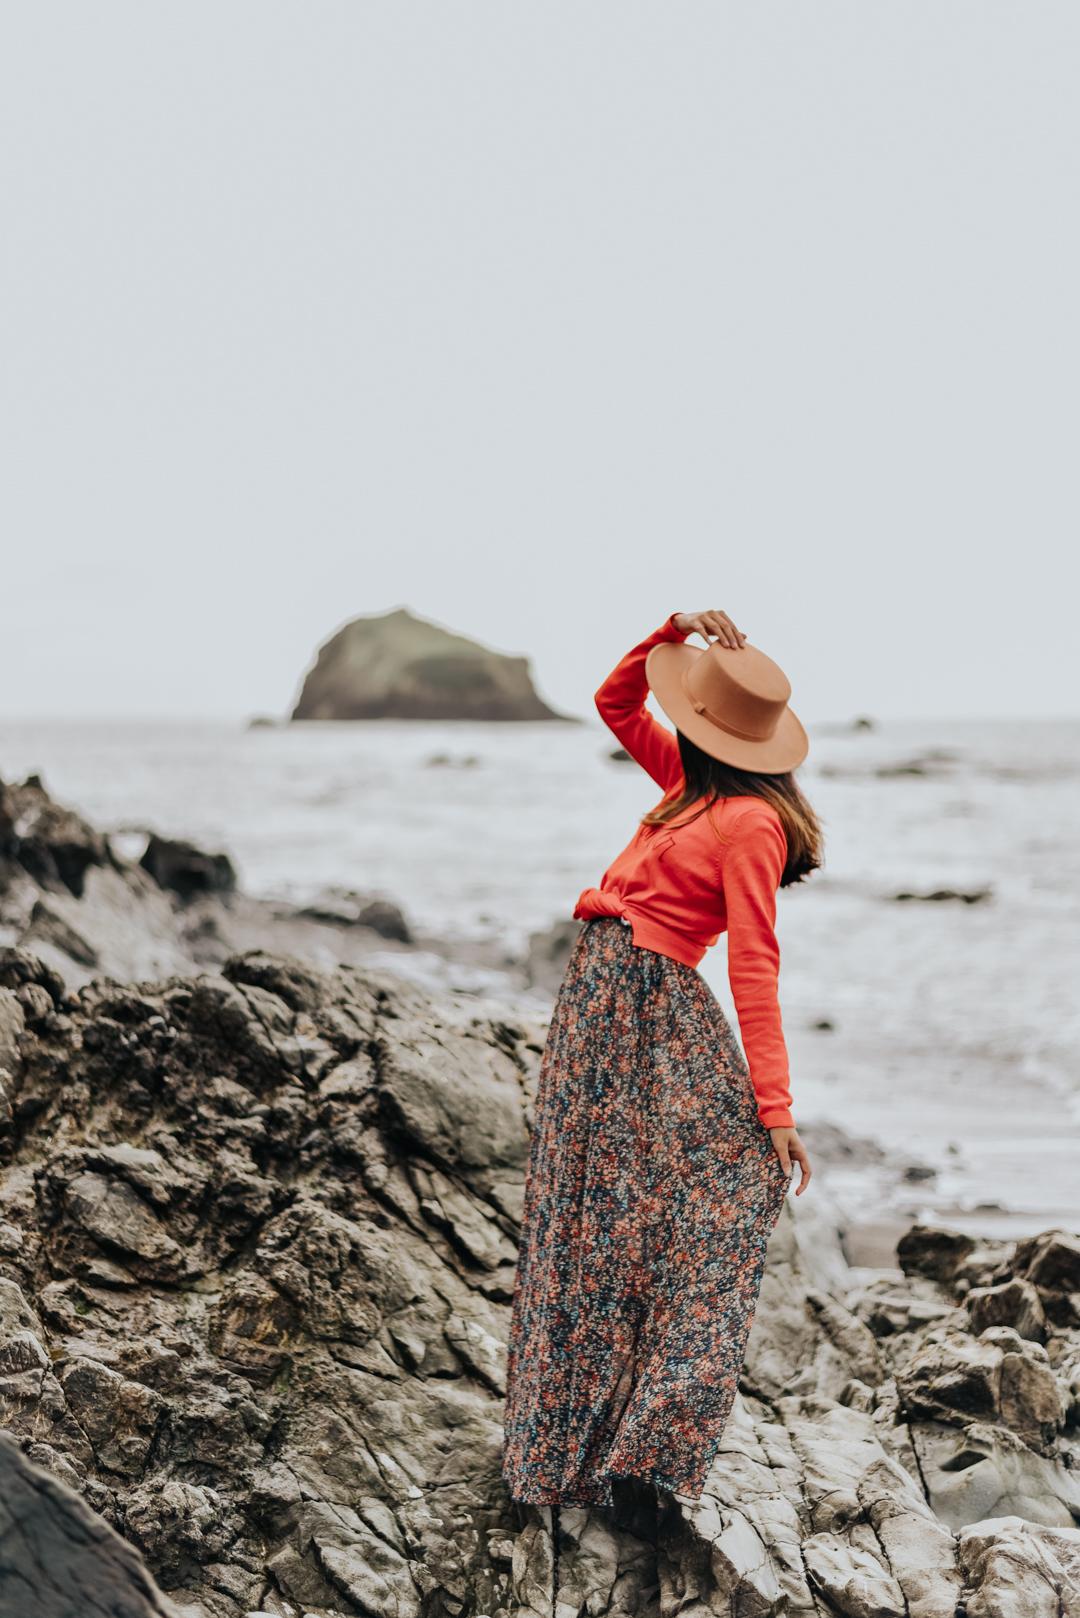 mendocino-staycation-van-damme-beach-guide 19